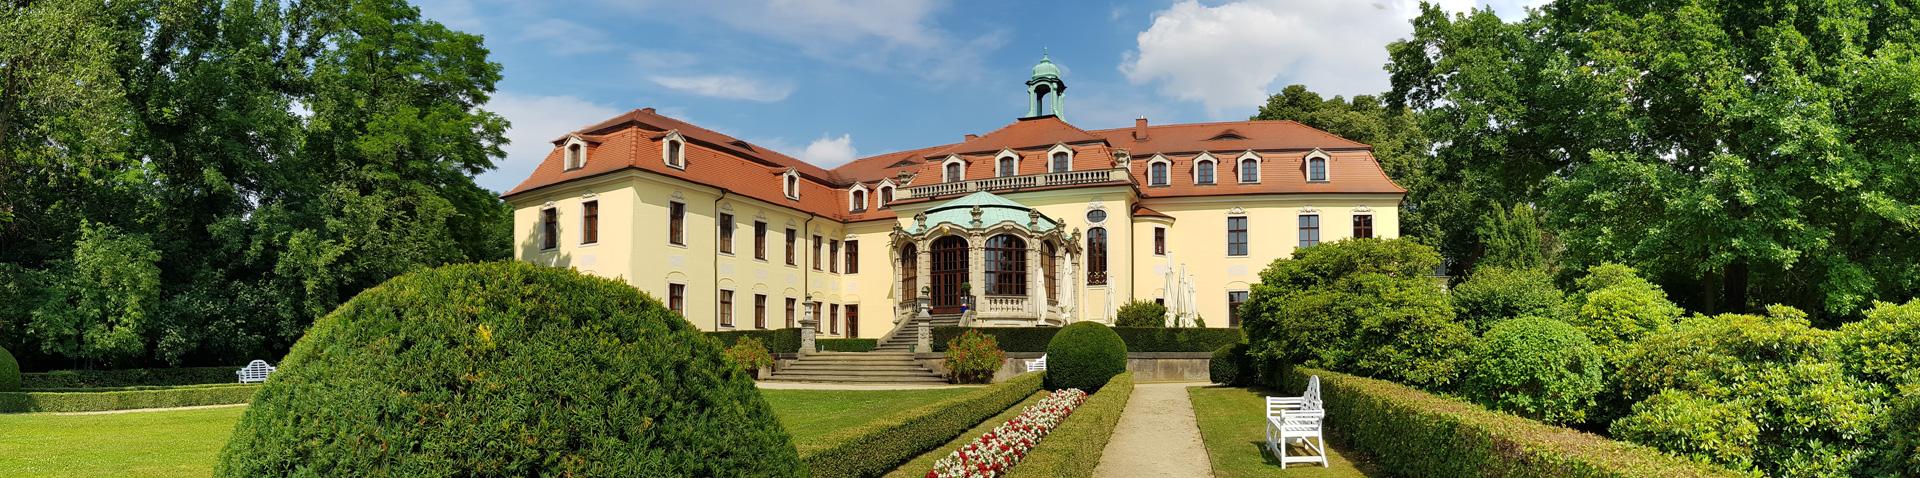 Location: Schloss Proschwitz